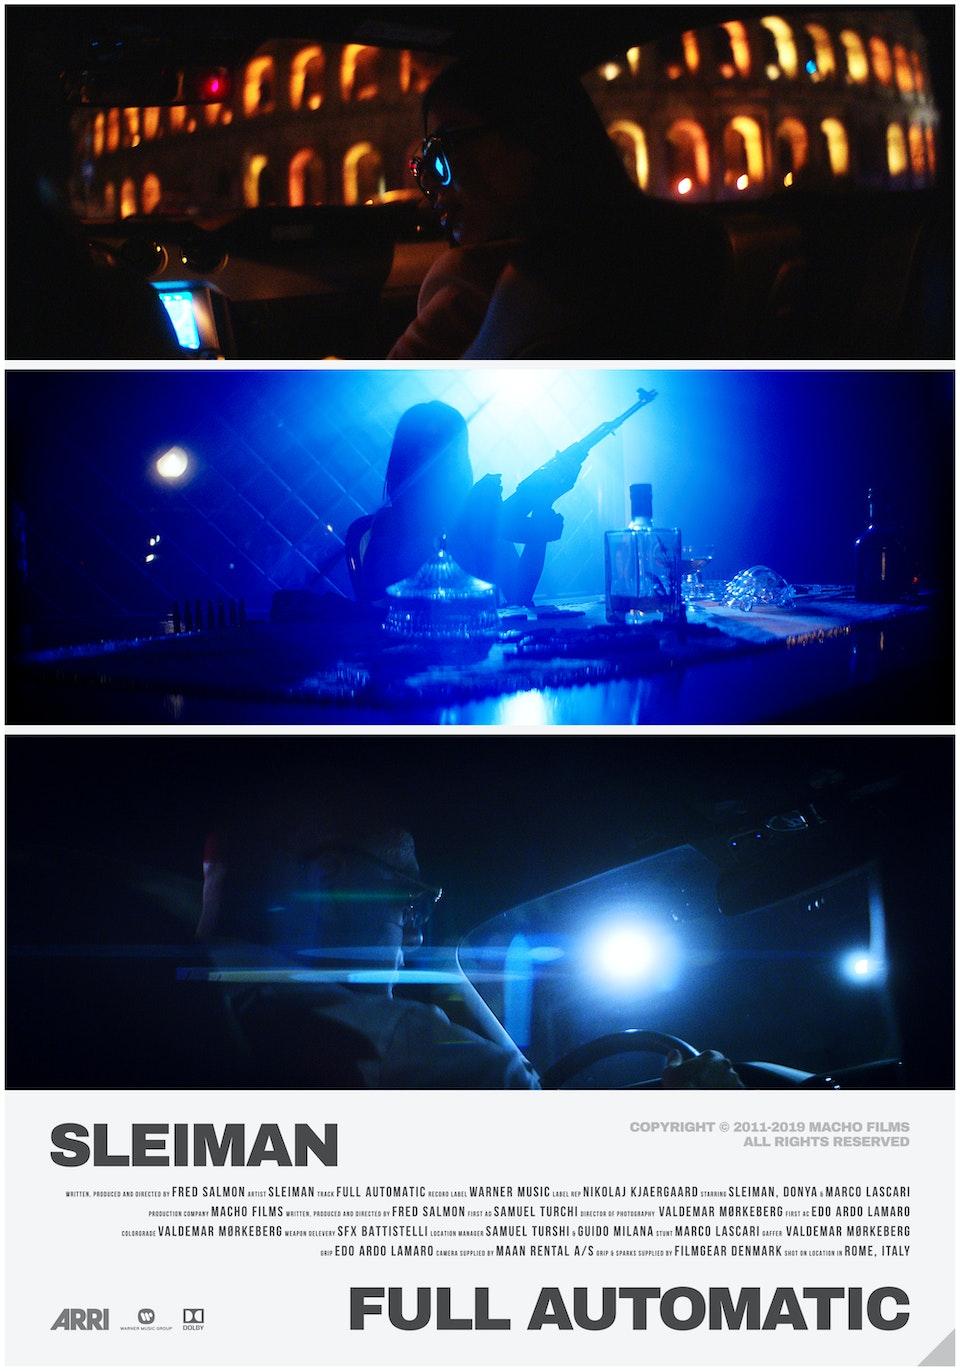 M A C H O - Sleiman // Full Automatic